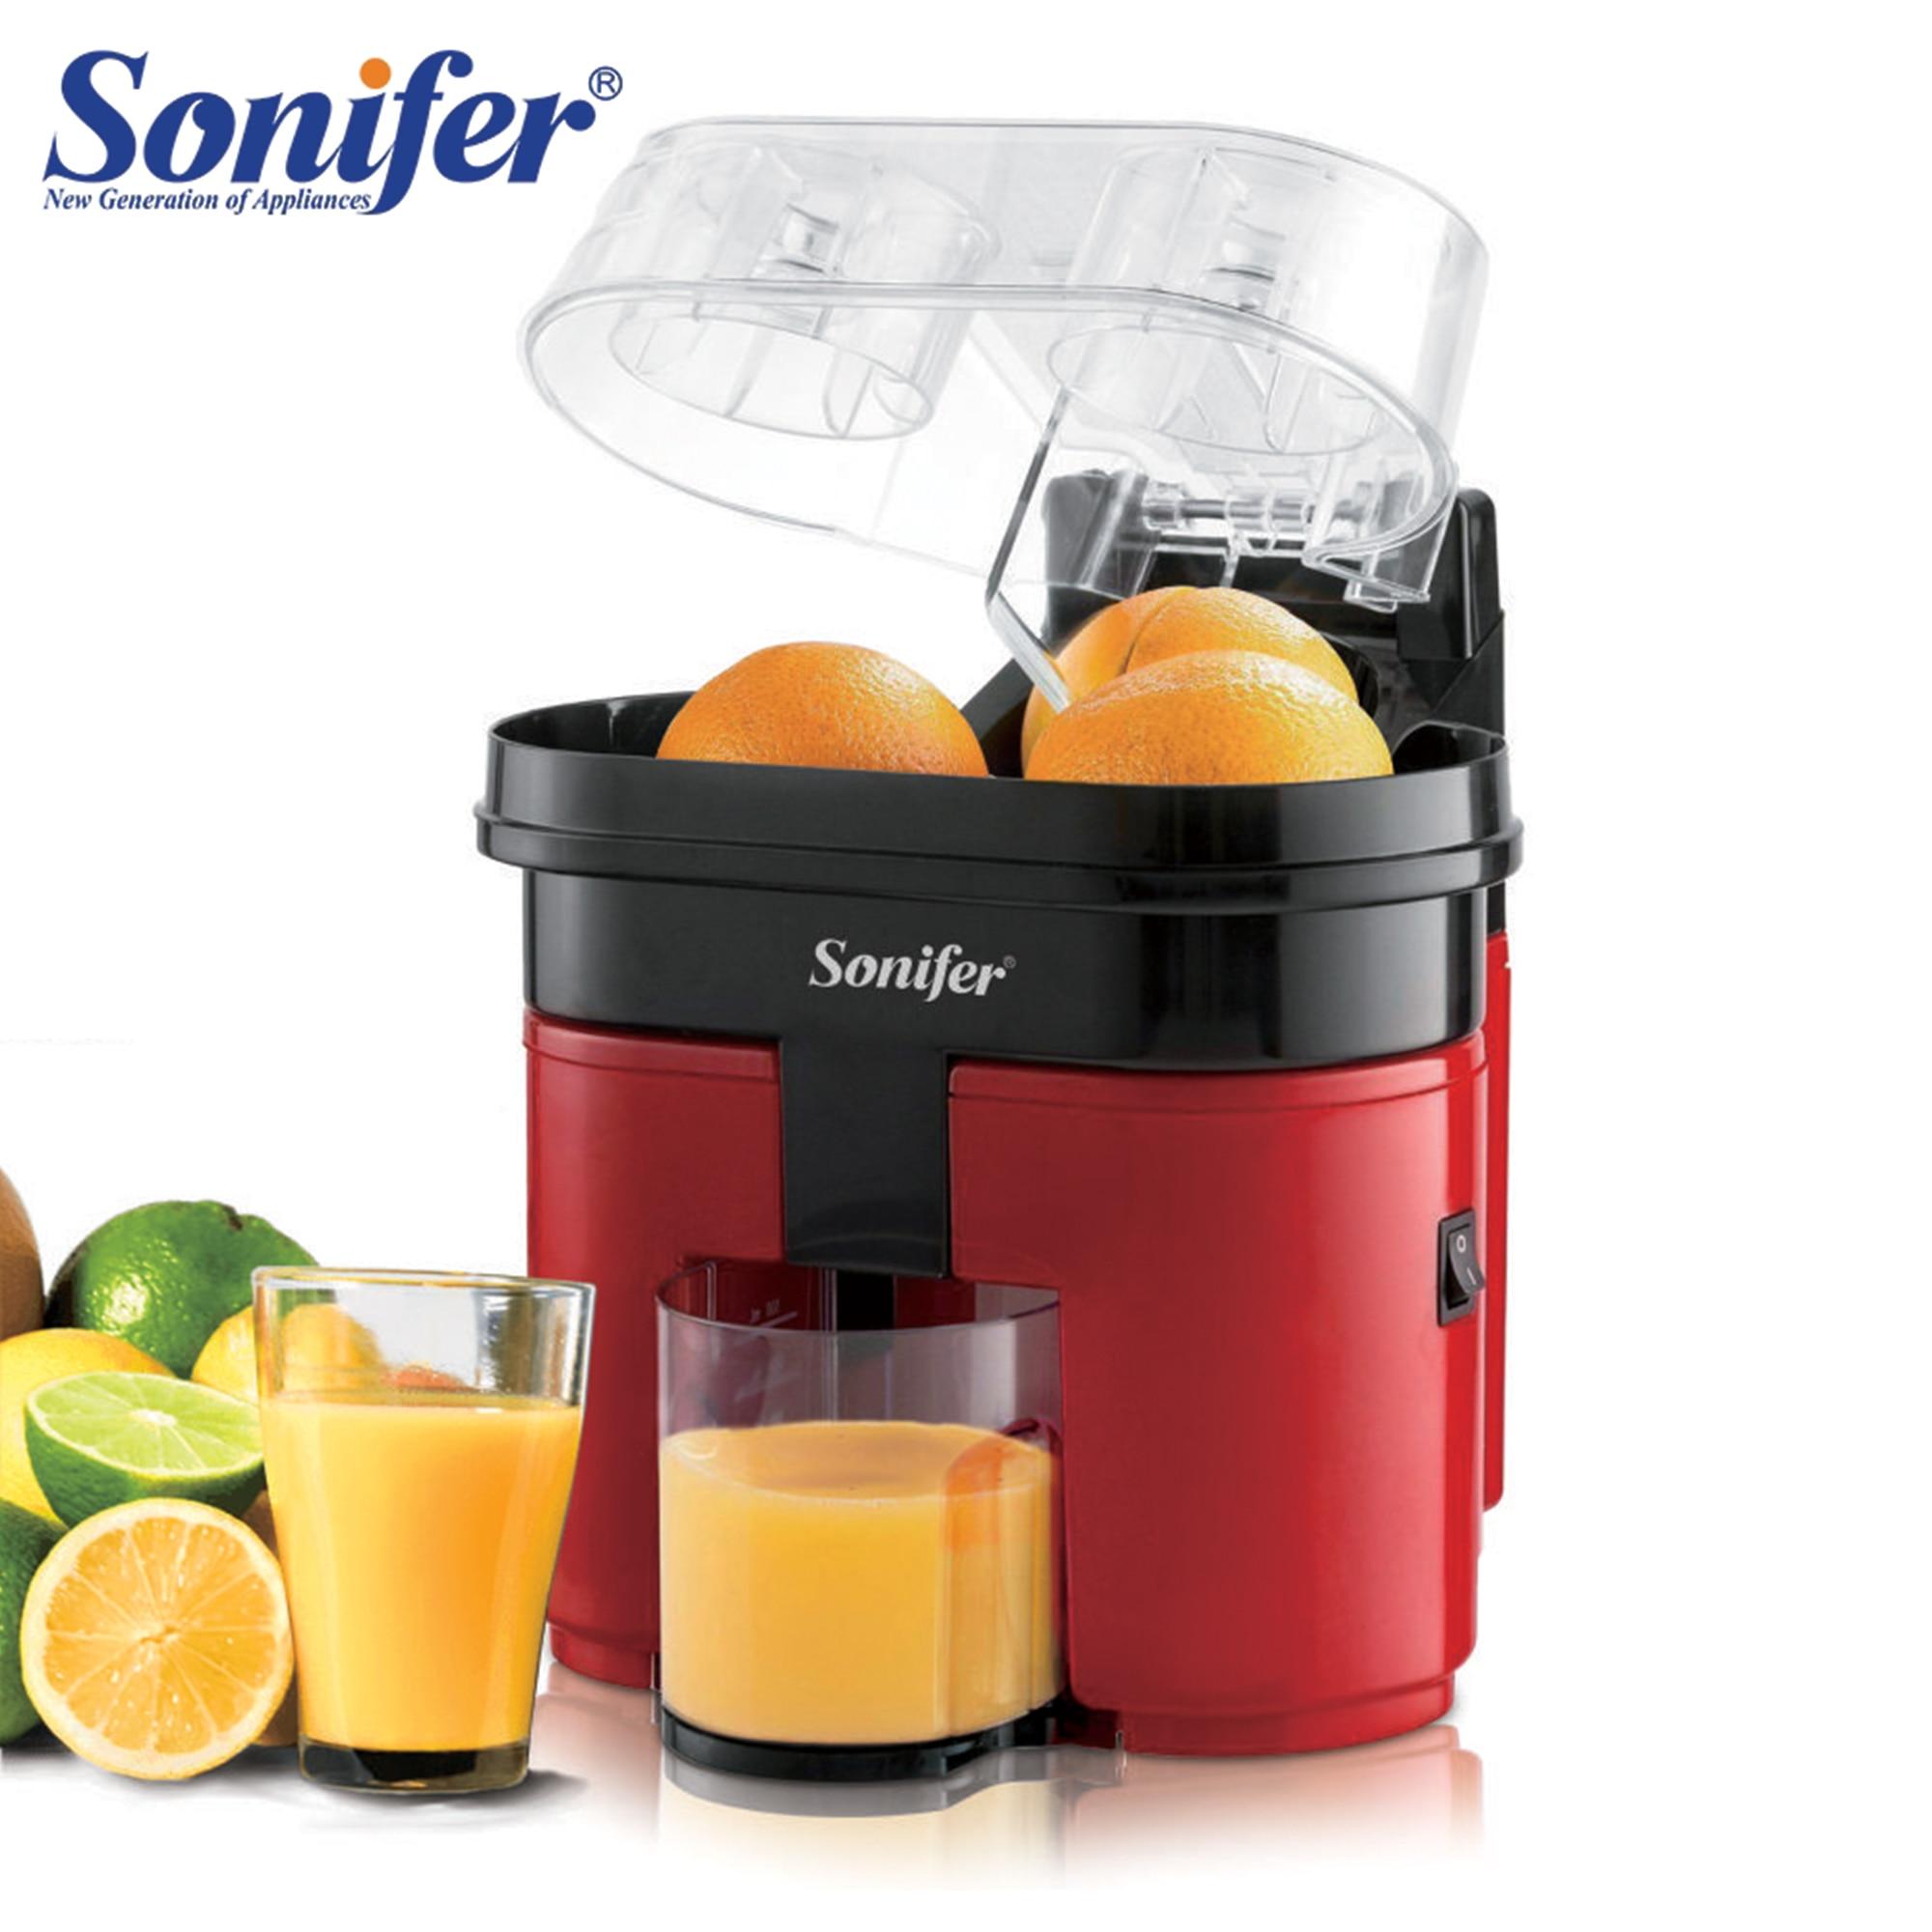 Stainless Steel Orange Lemon Electric Juicers 90W Fruit Squeezer Fresh Juice Household Sonifer